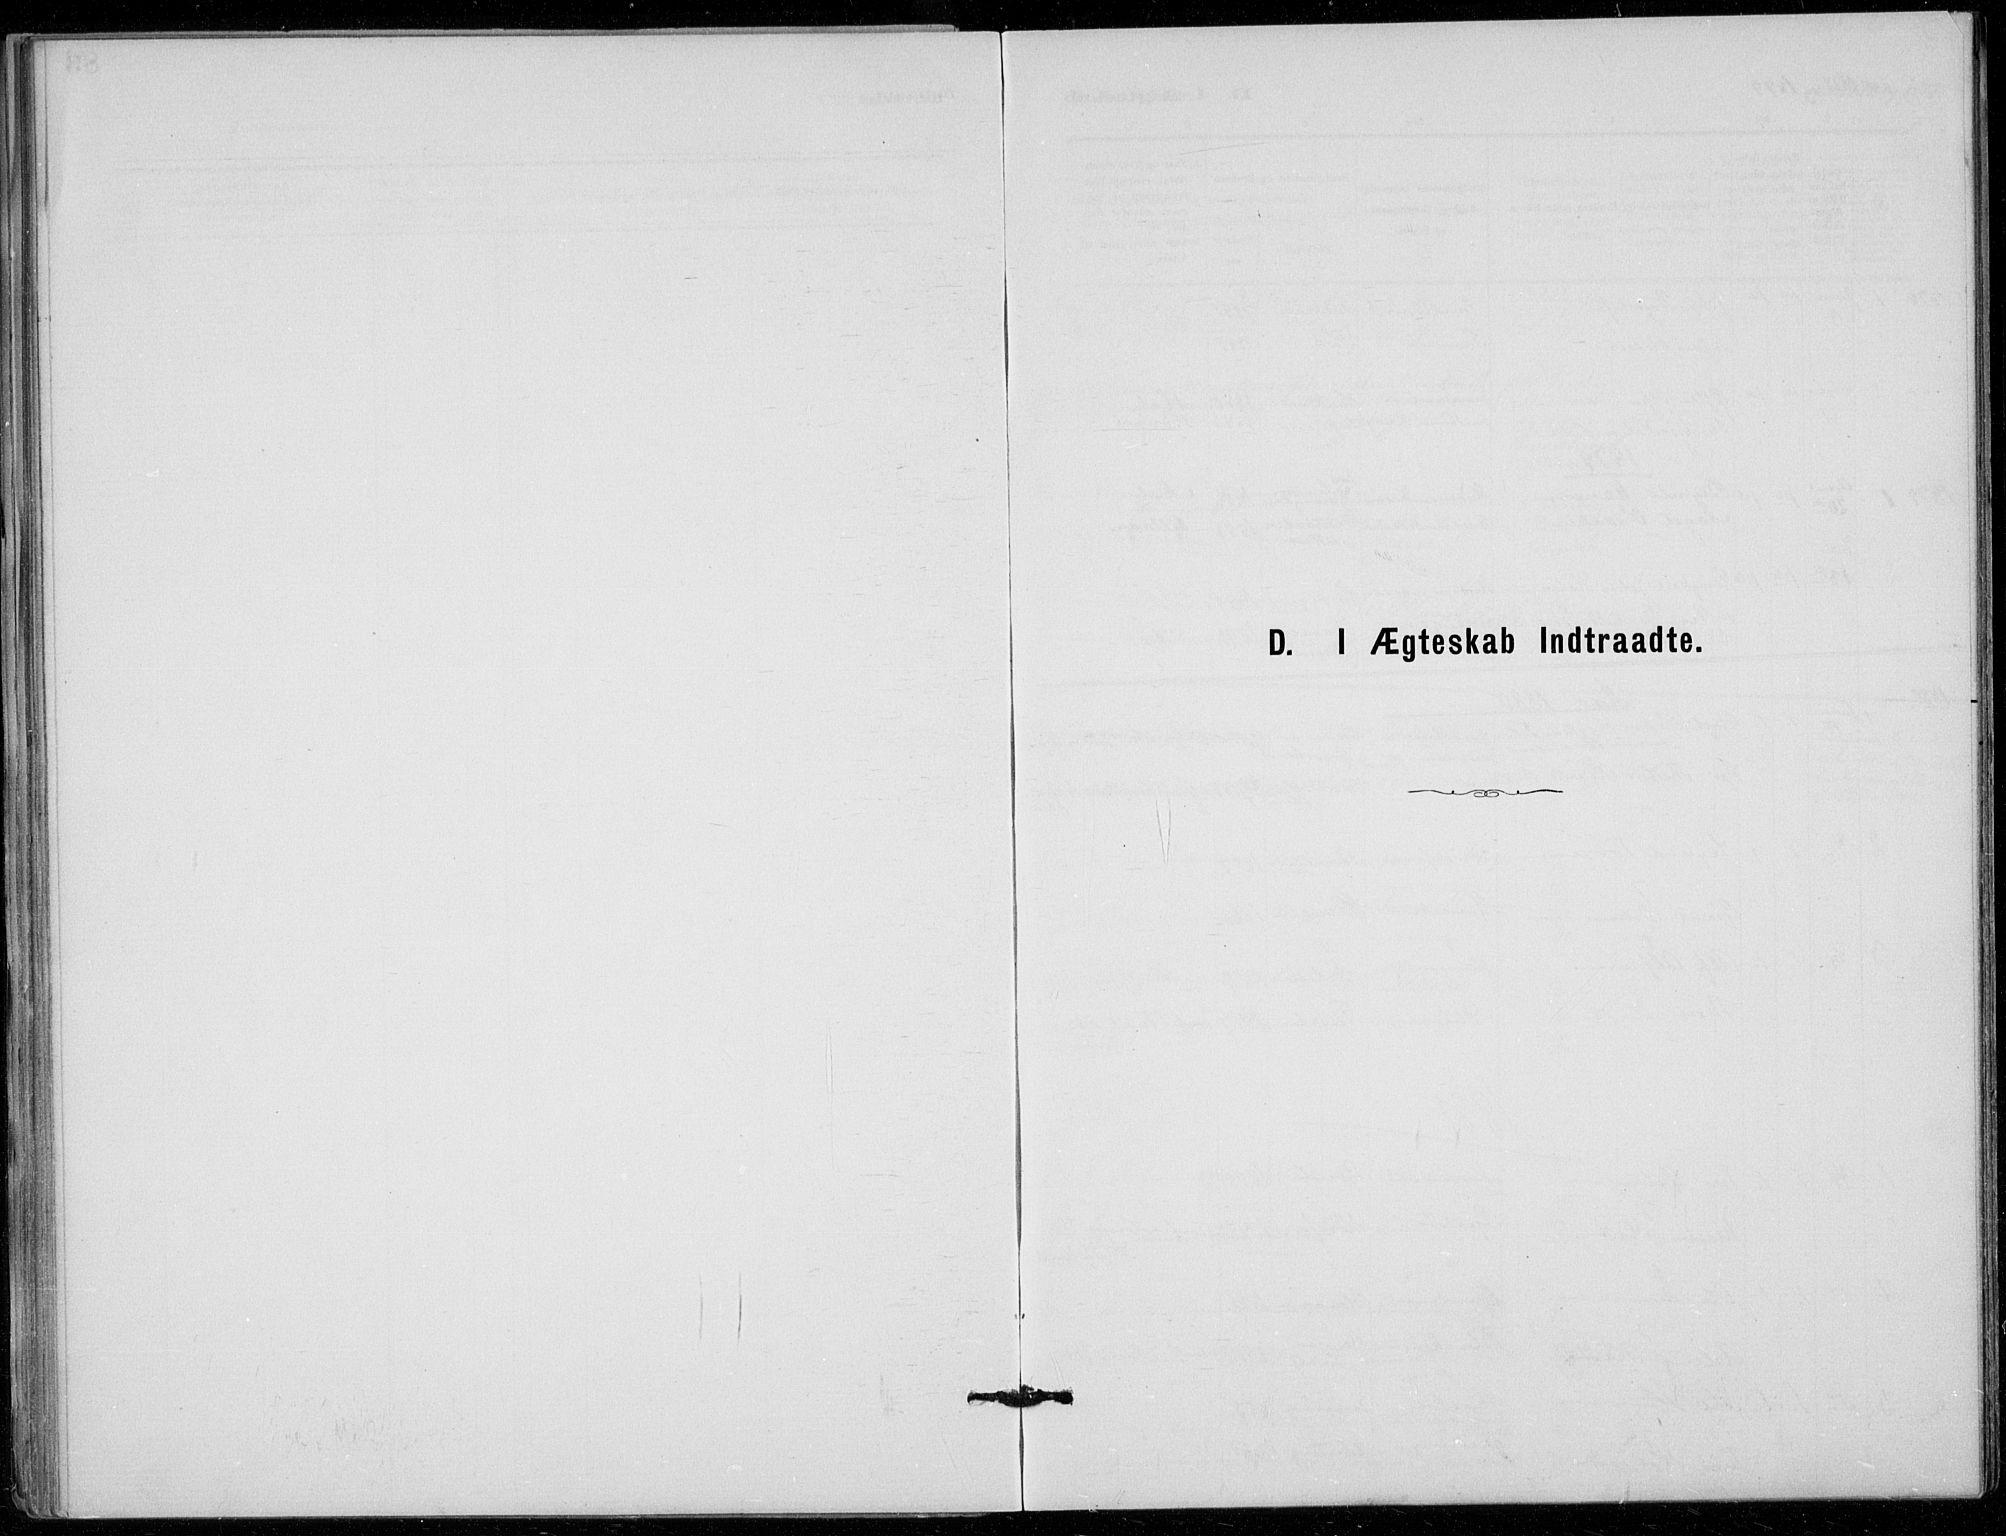 SAKO, Tinn kirkebøker, F/Fb/L0002: Ministerialbok nr. II 2, 1878-1917